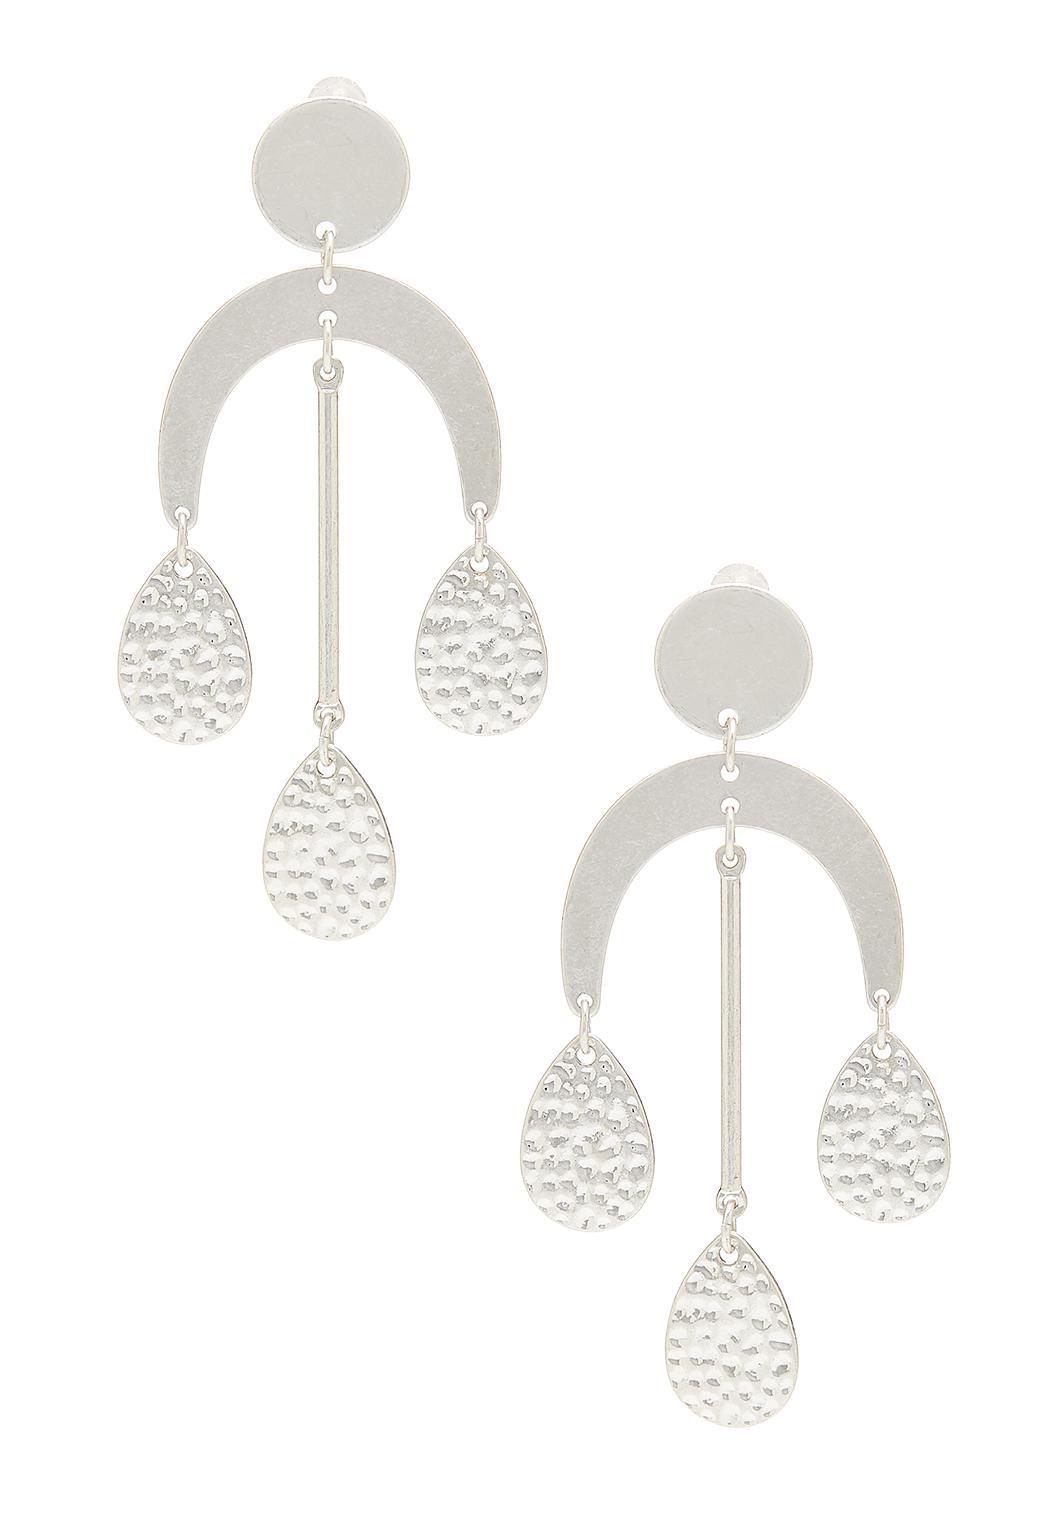 Silver Mobile Earrings